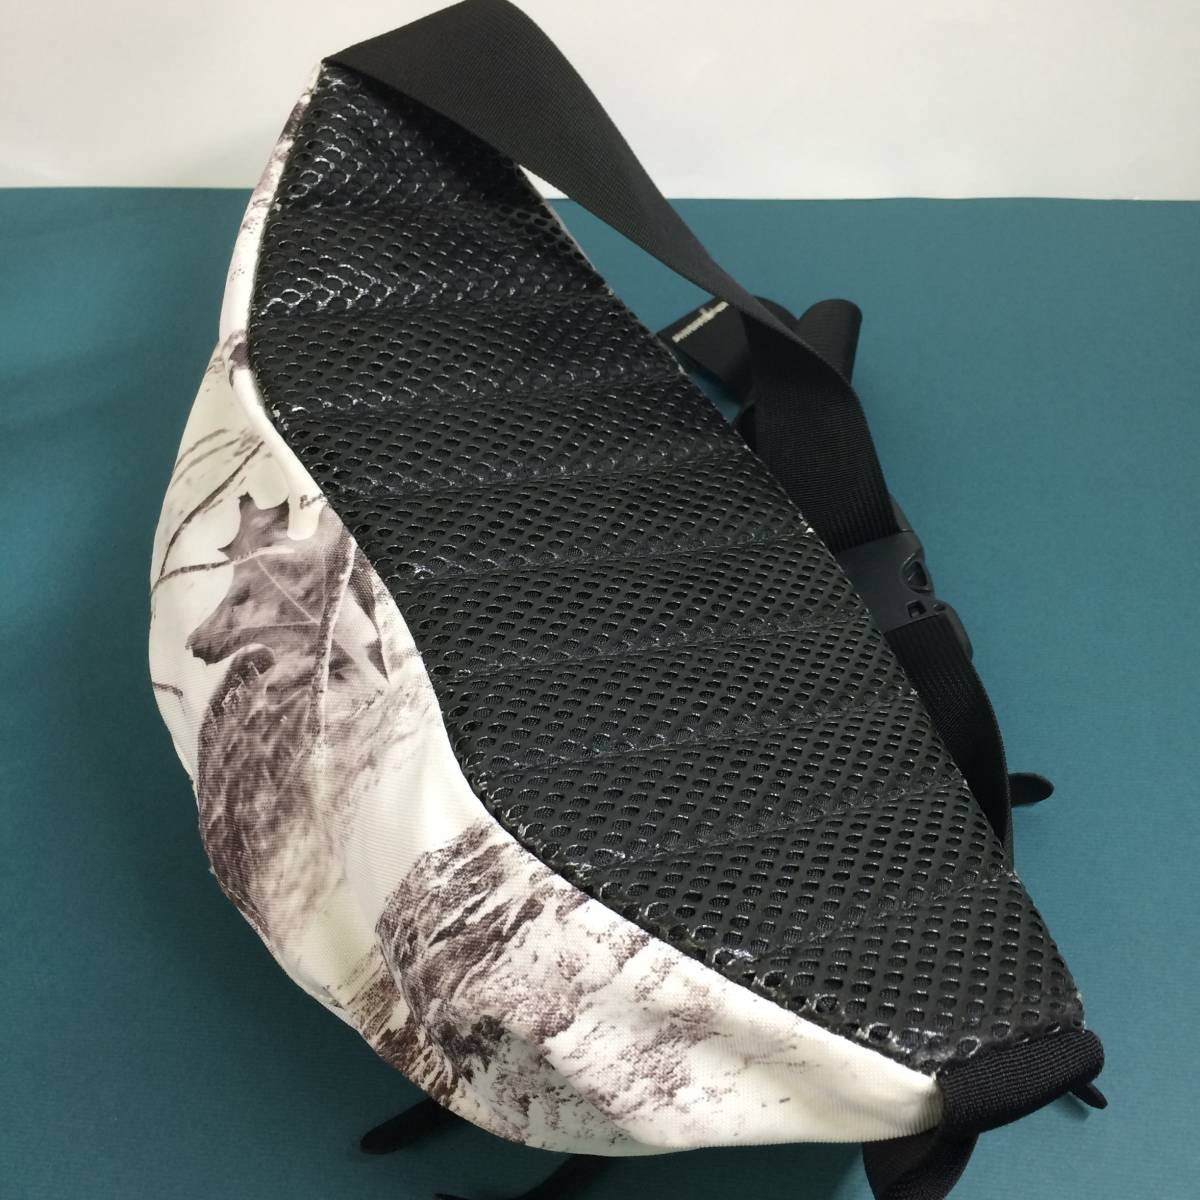 USA製 グレゴリー テールメイトS ホワイトティンバー スノーカモ 迷彩 ボディバッグ